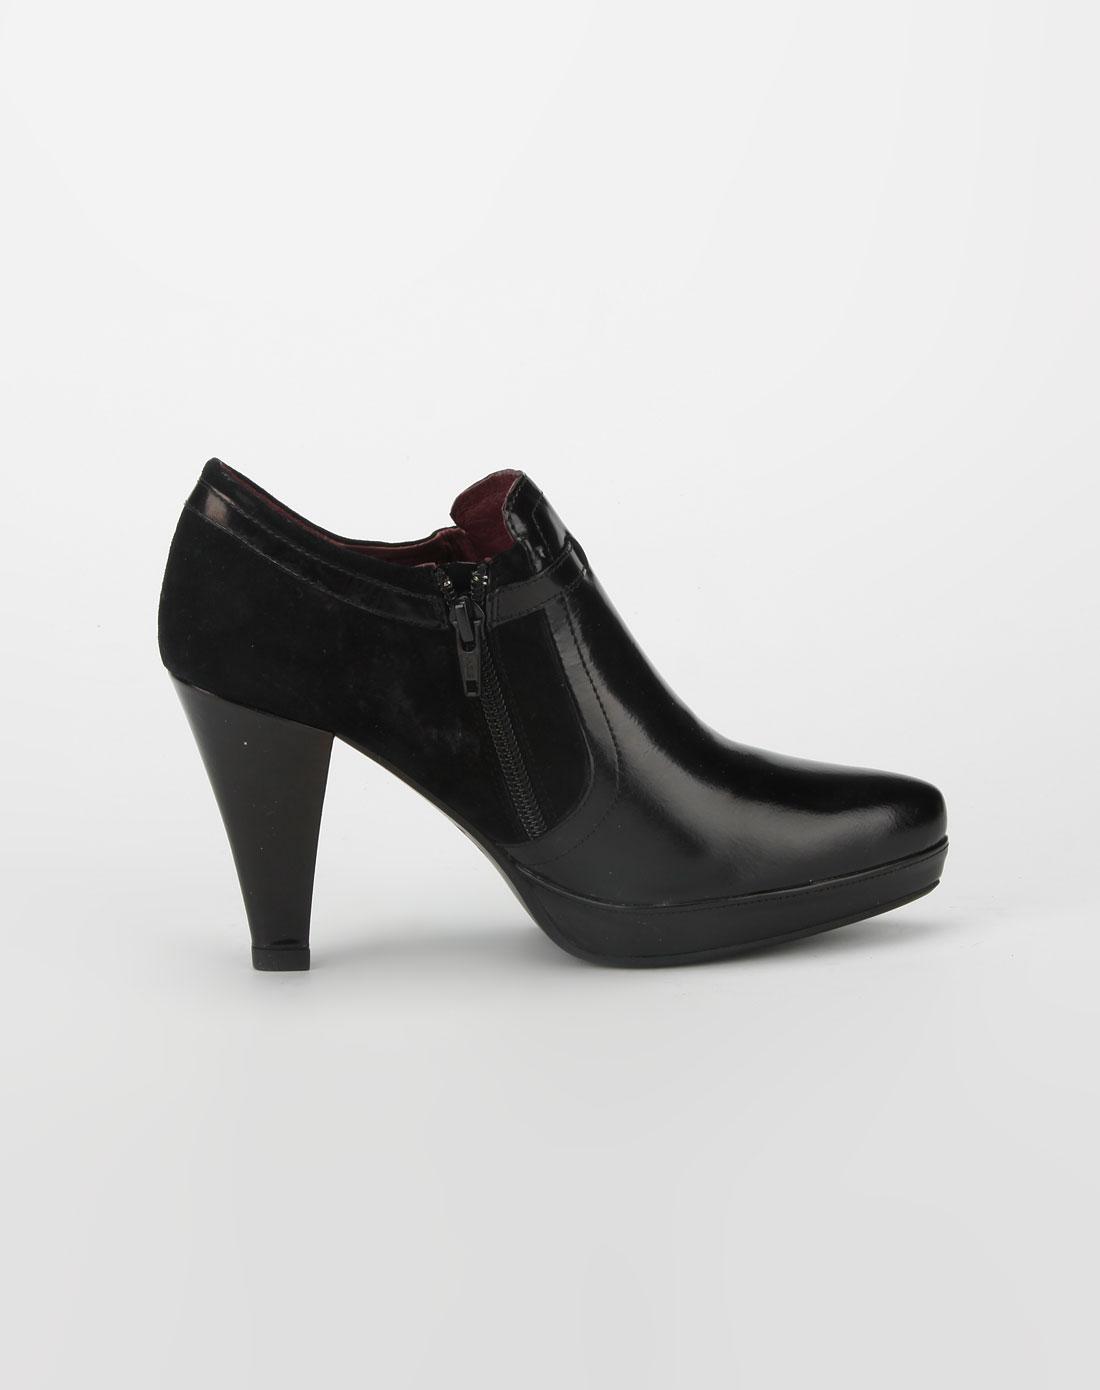 elle 黑色拉链高跟皮鞋